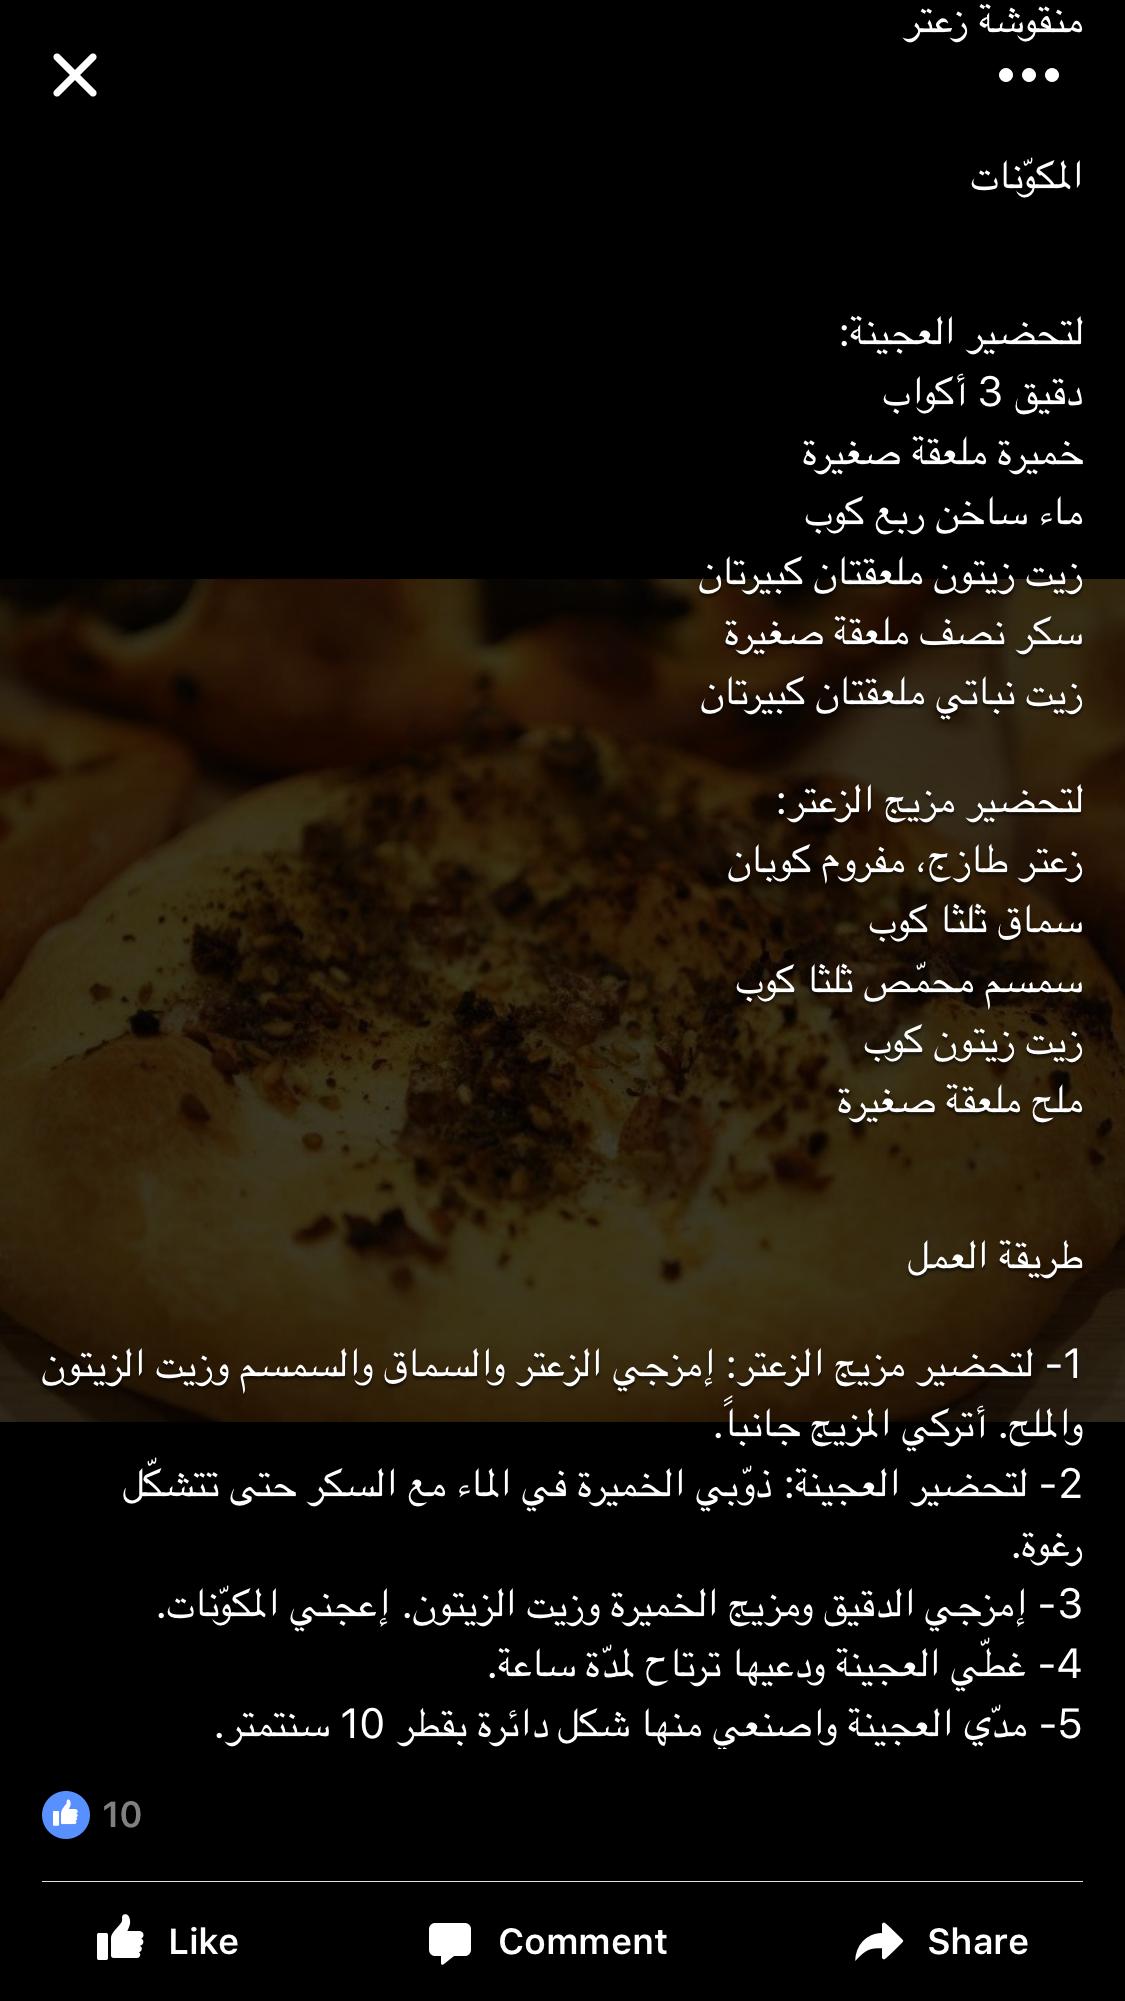 منقوشة زعتر Cooking Recipes Middle Eastern Recipes Pancakes And Waffles